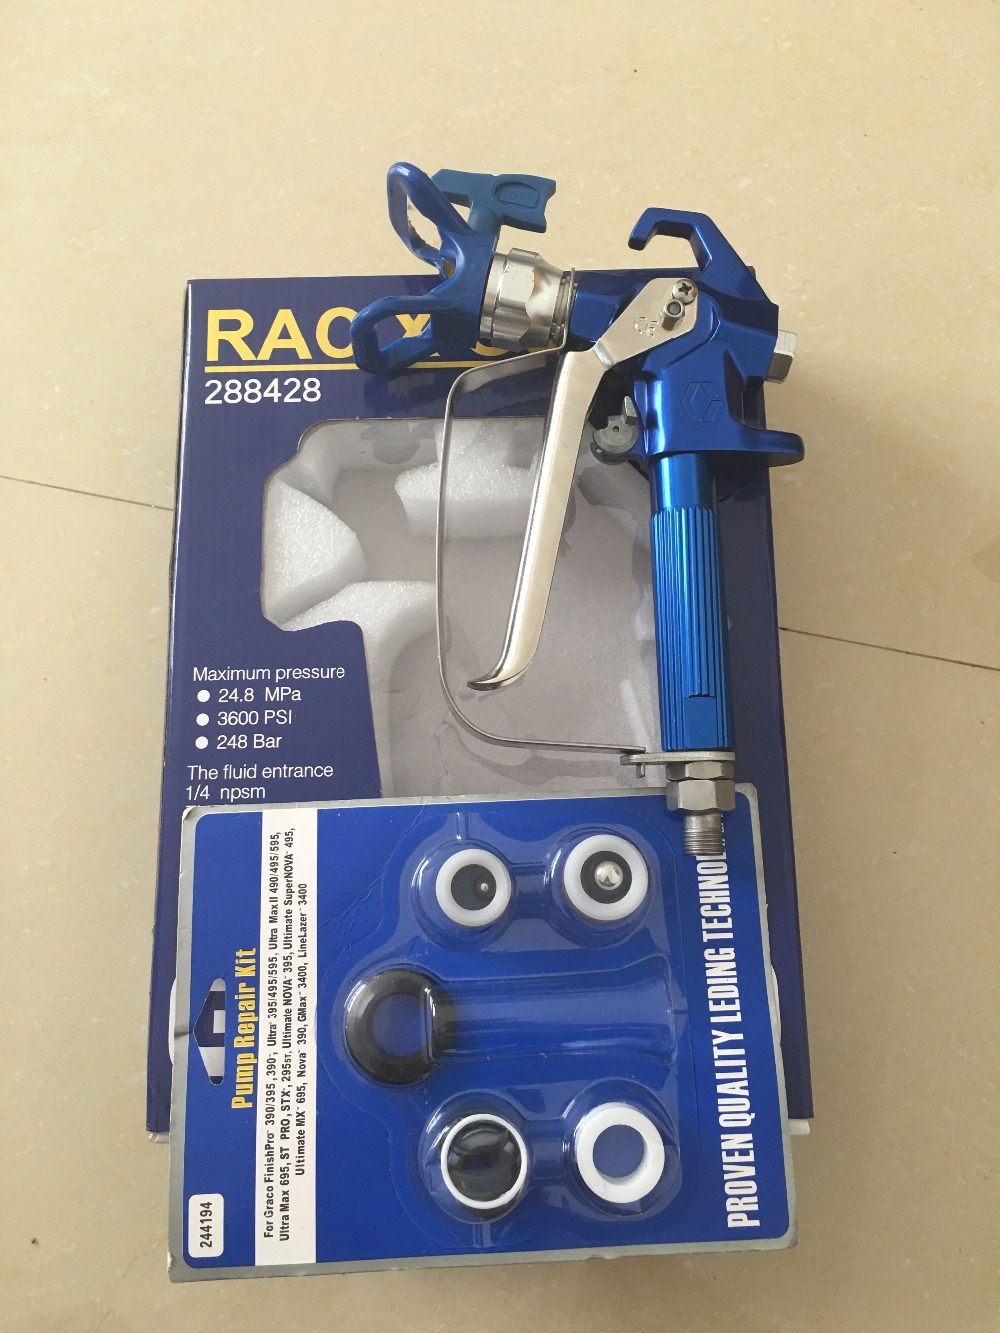 Airless paint sprayer parts Airless paint sprayer gun with pump repair kit for 390 395 490 495 595 airless paint sprayer<br><br>Aliexpress